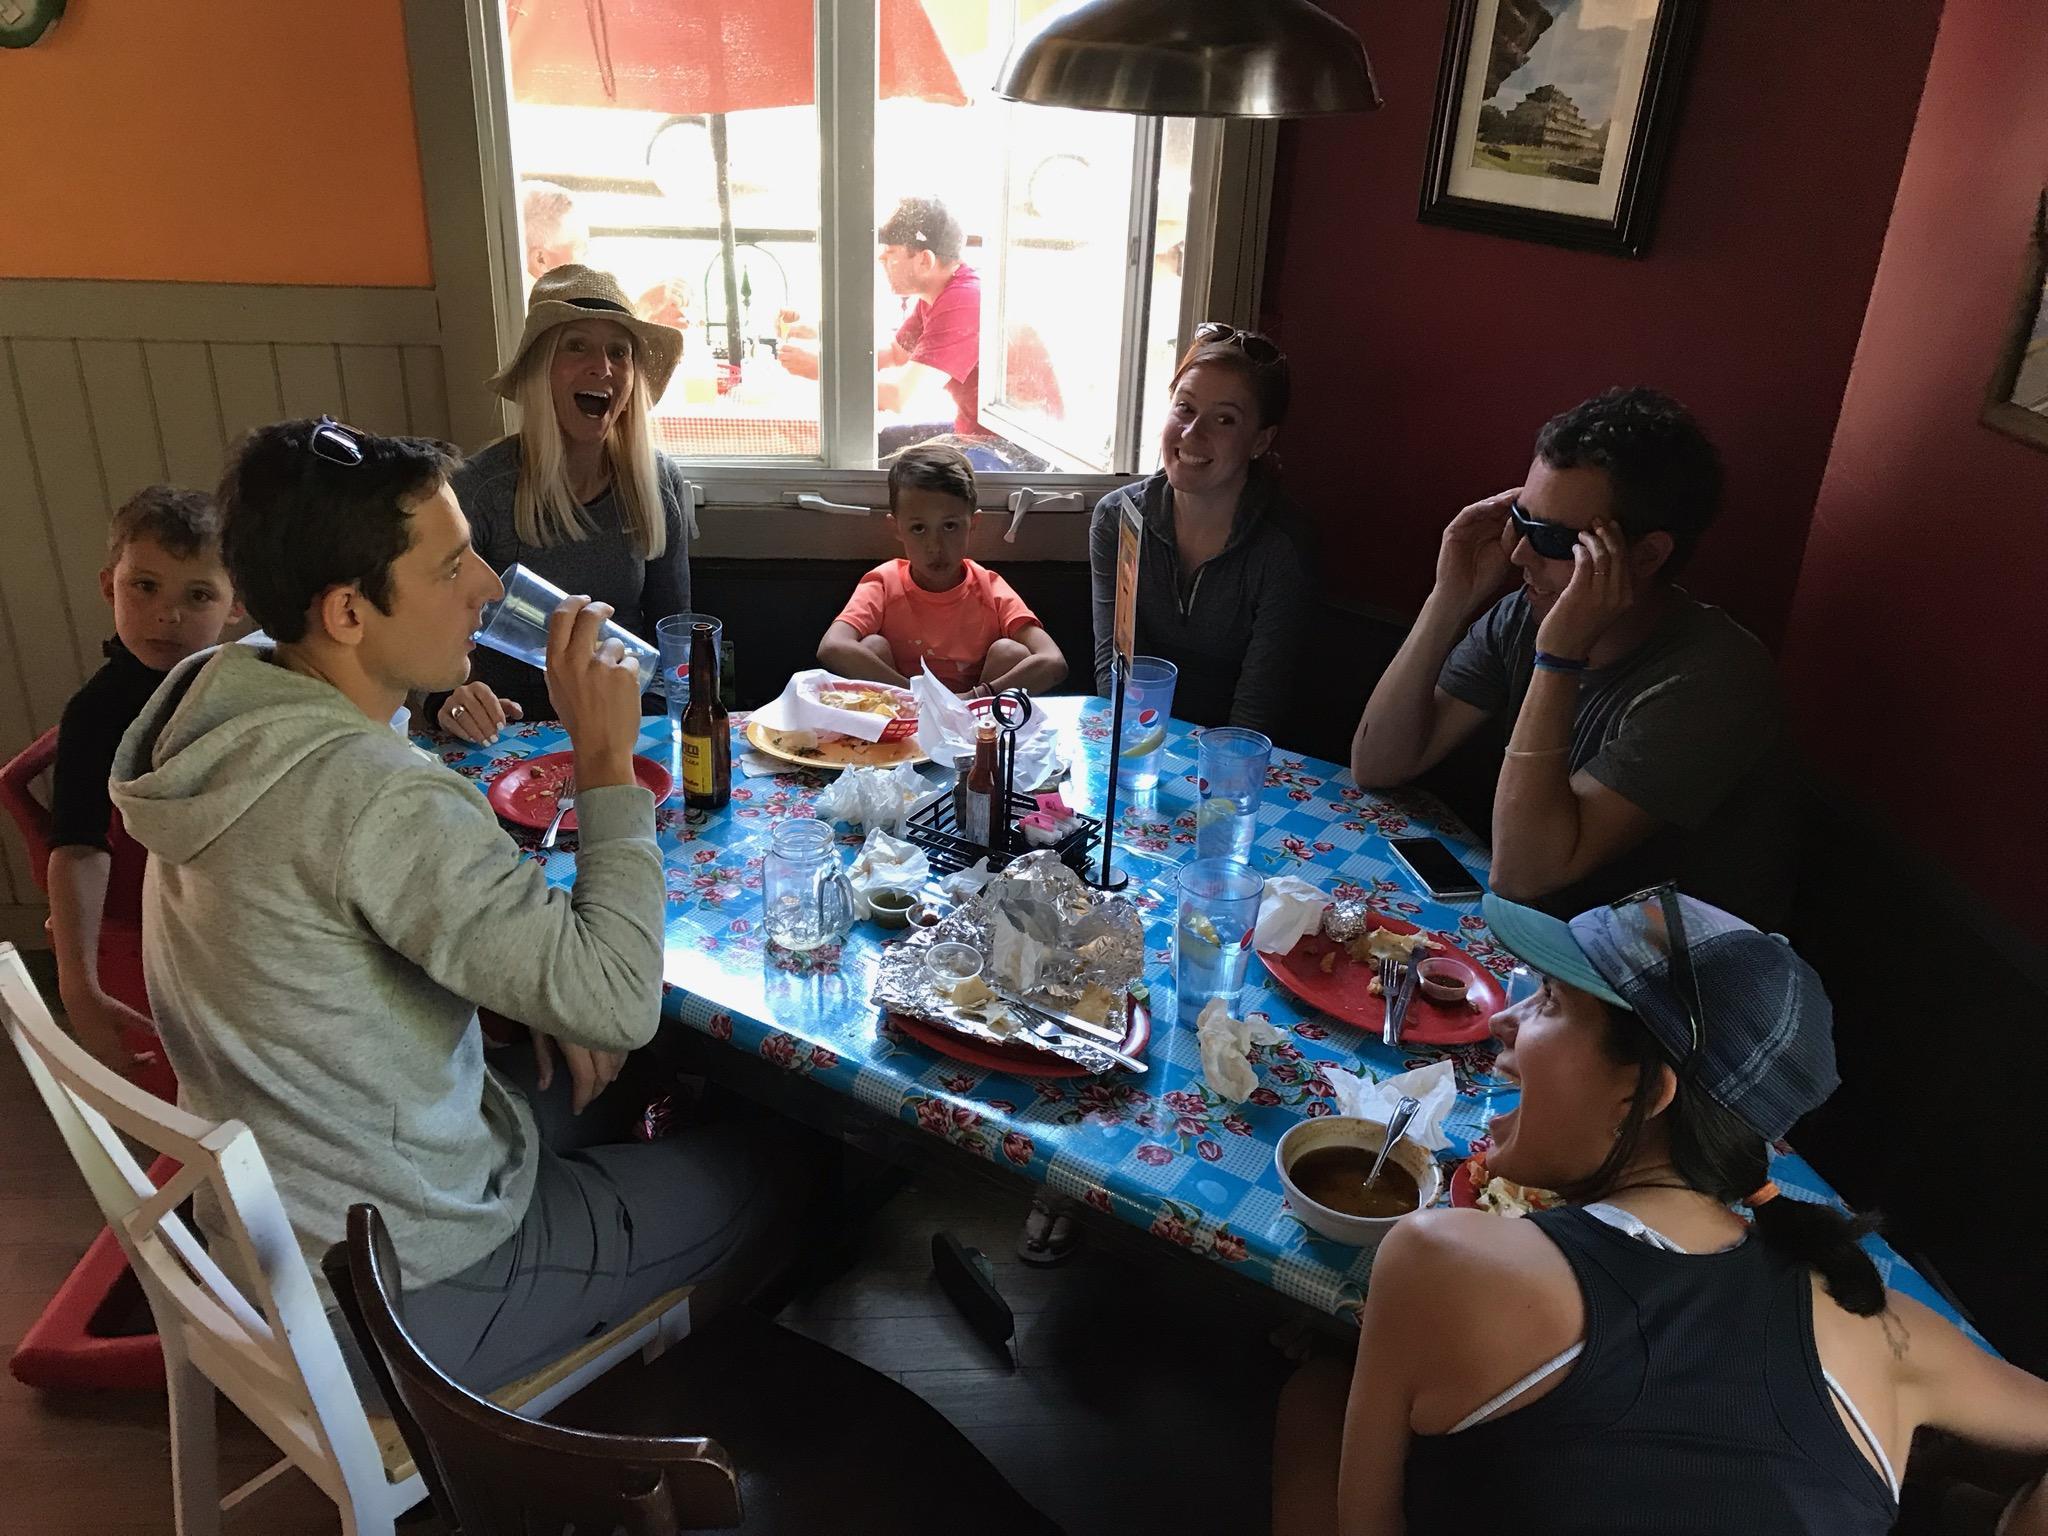 Giant burrito-eating meals!